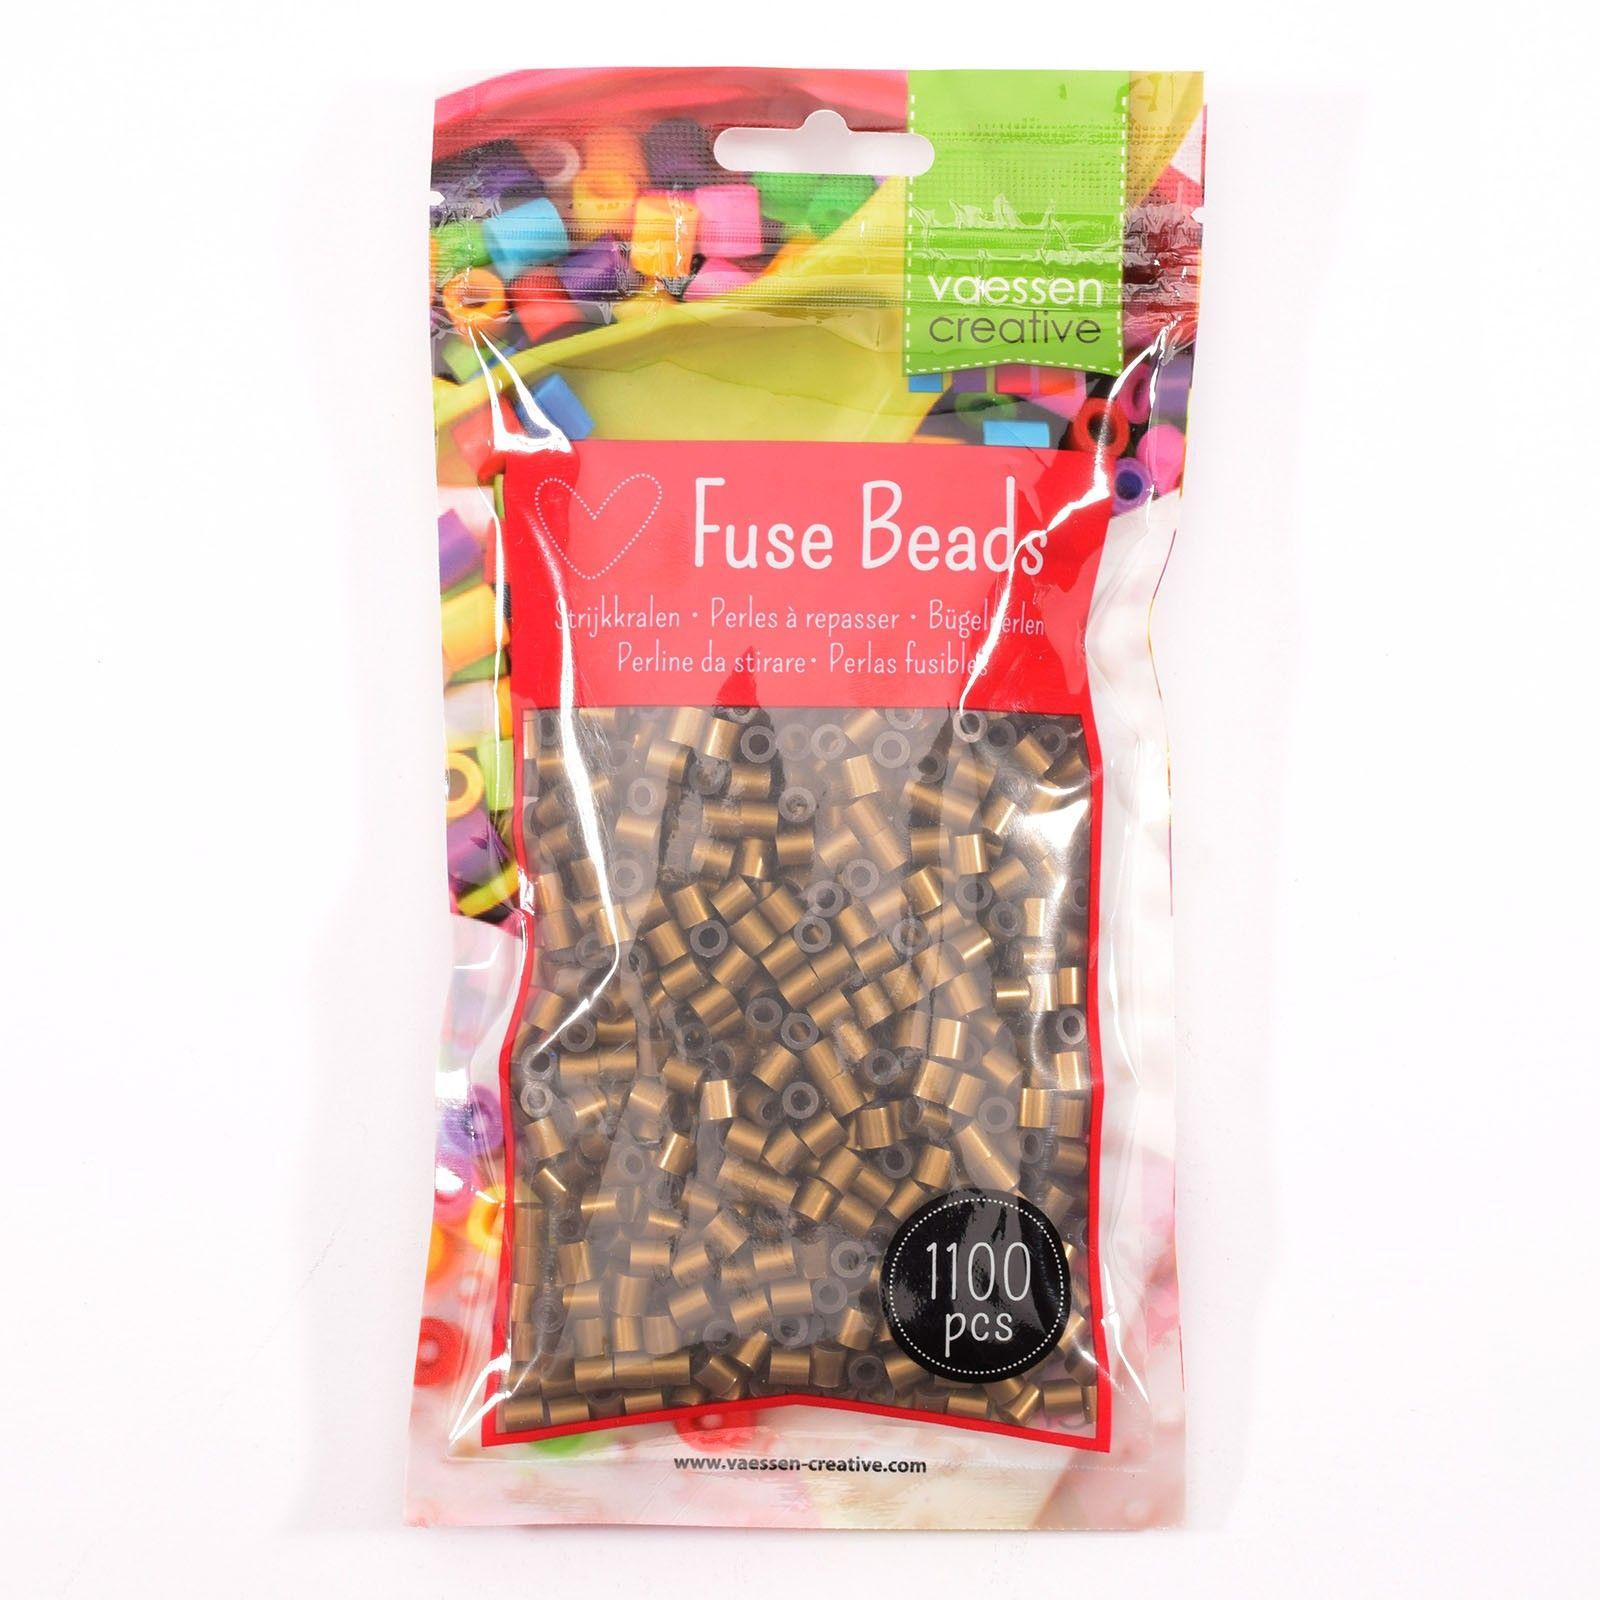 Sachet de 1100 perles à repasser - Ø 5 mm Coloris or